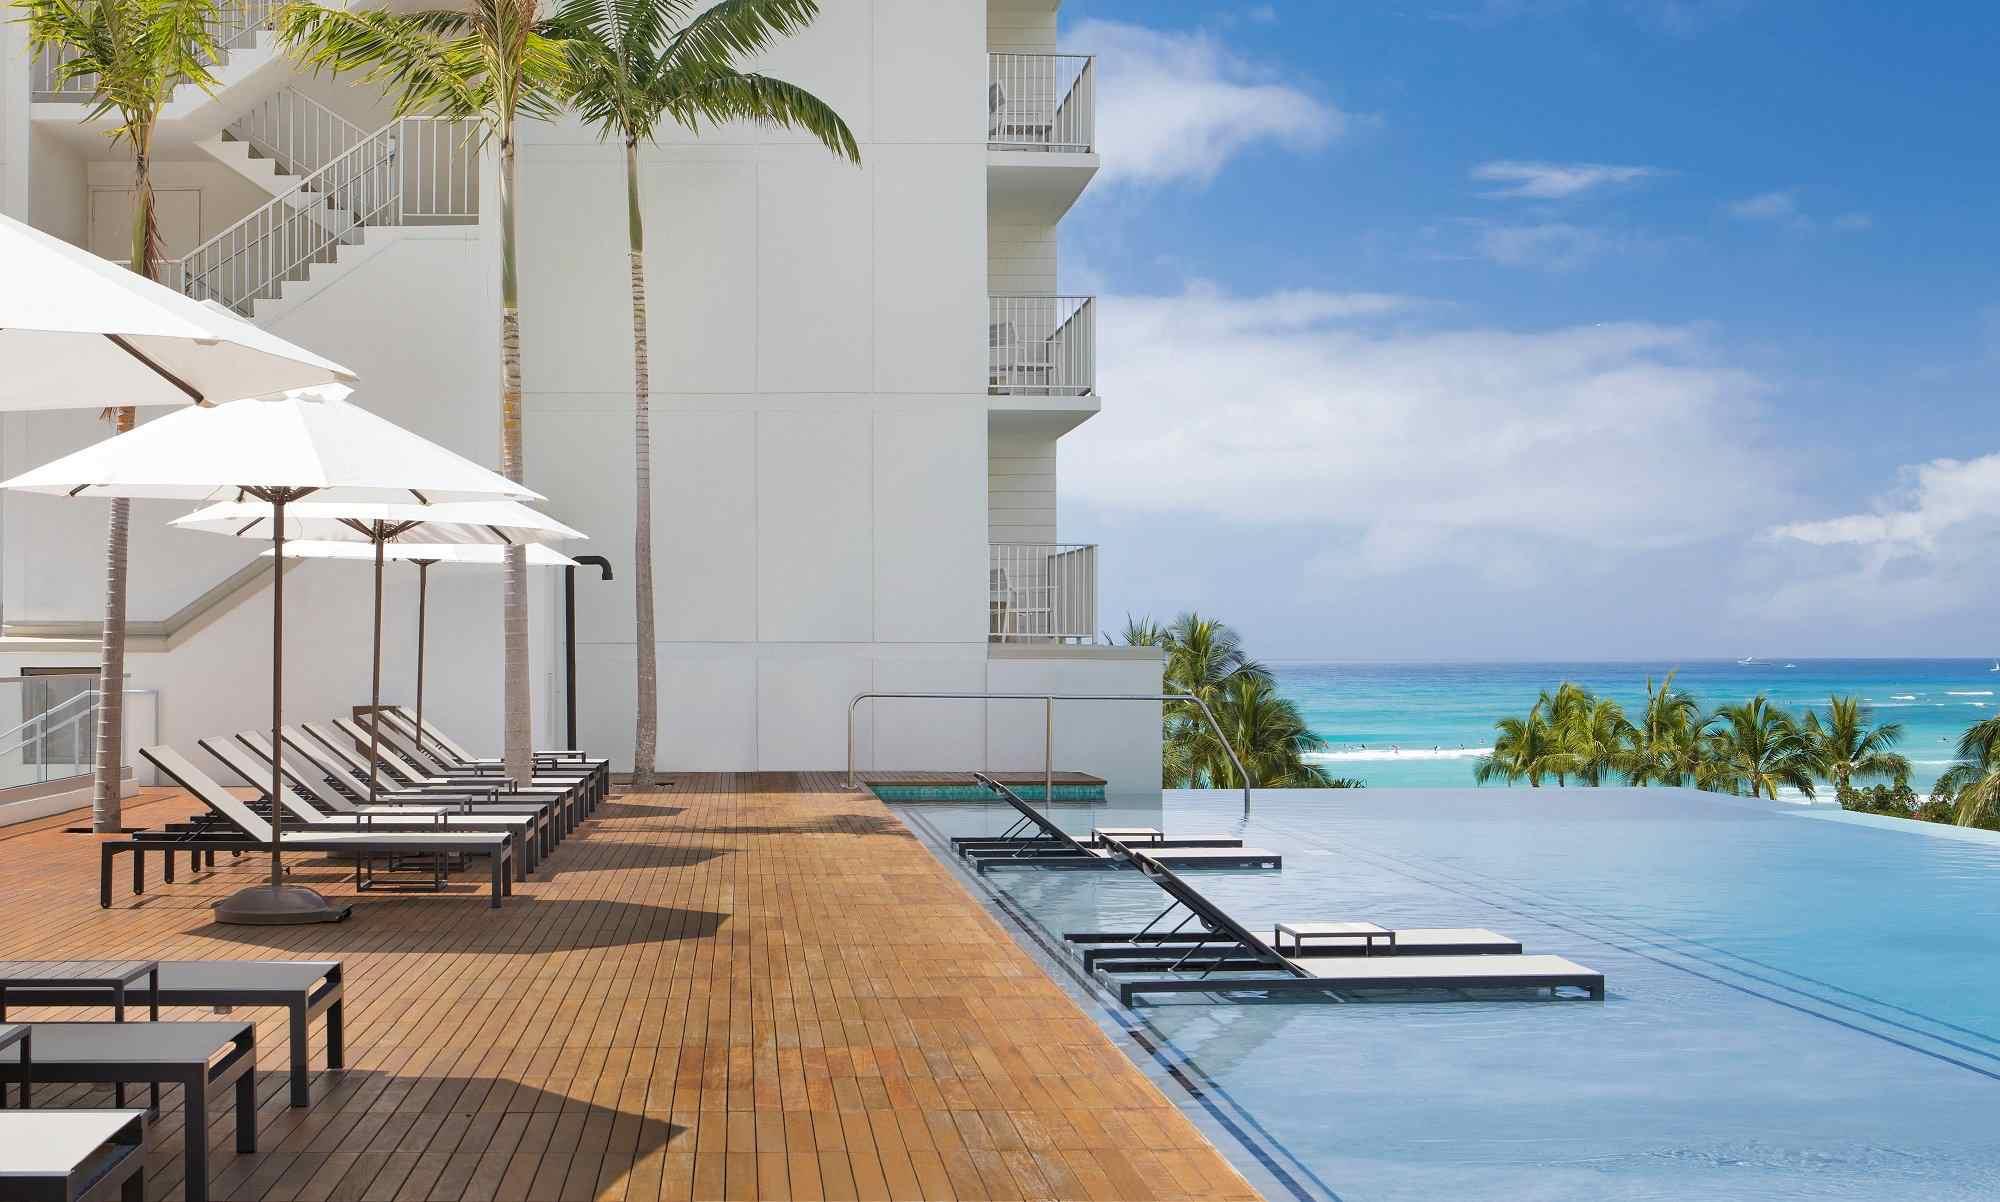 'Alohilani Resort Waikiki Beach, Oahu